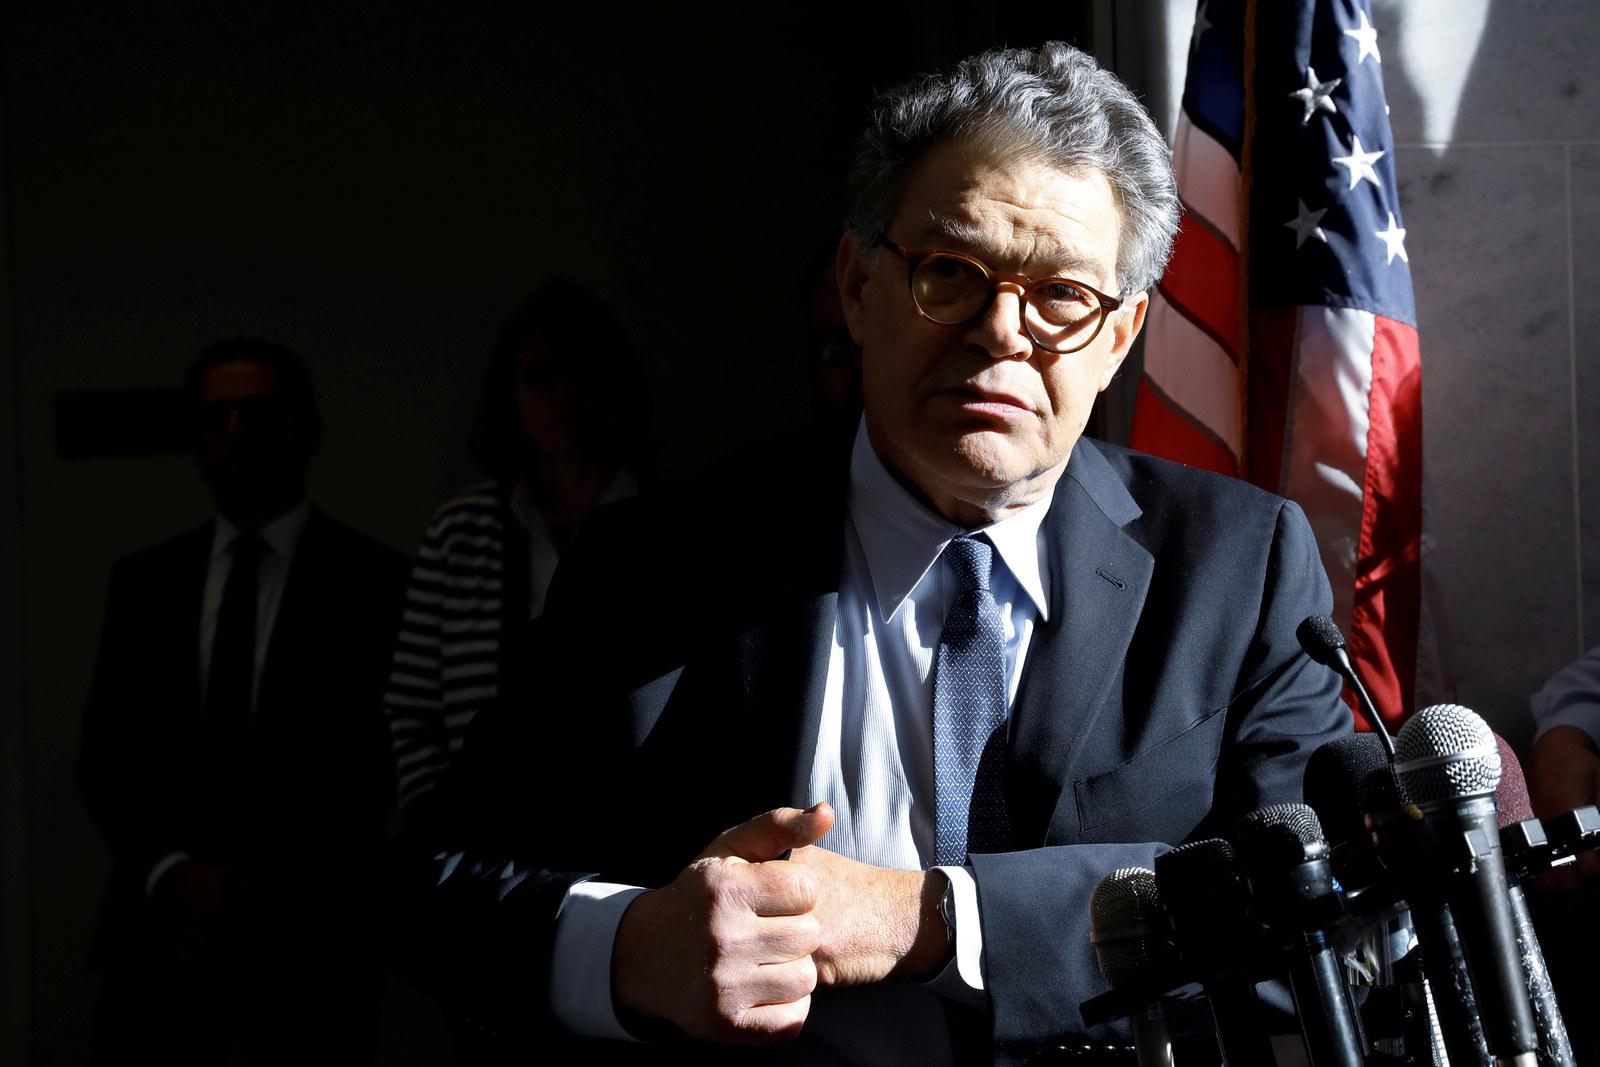 Sen. Al Franken Is Resigning Following Sexual Misconduct Accusations